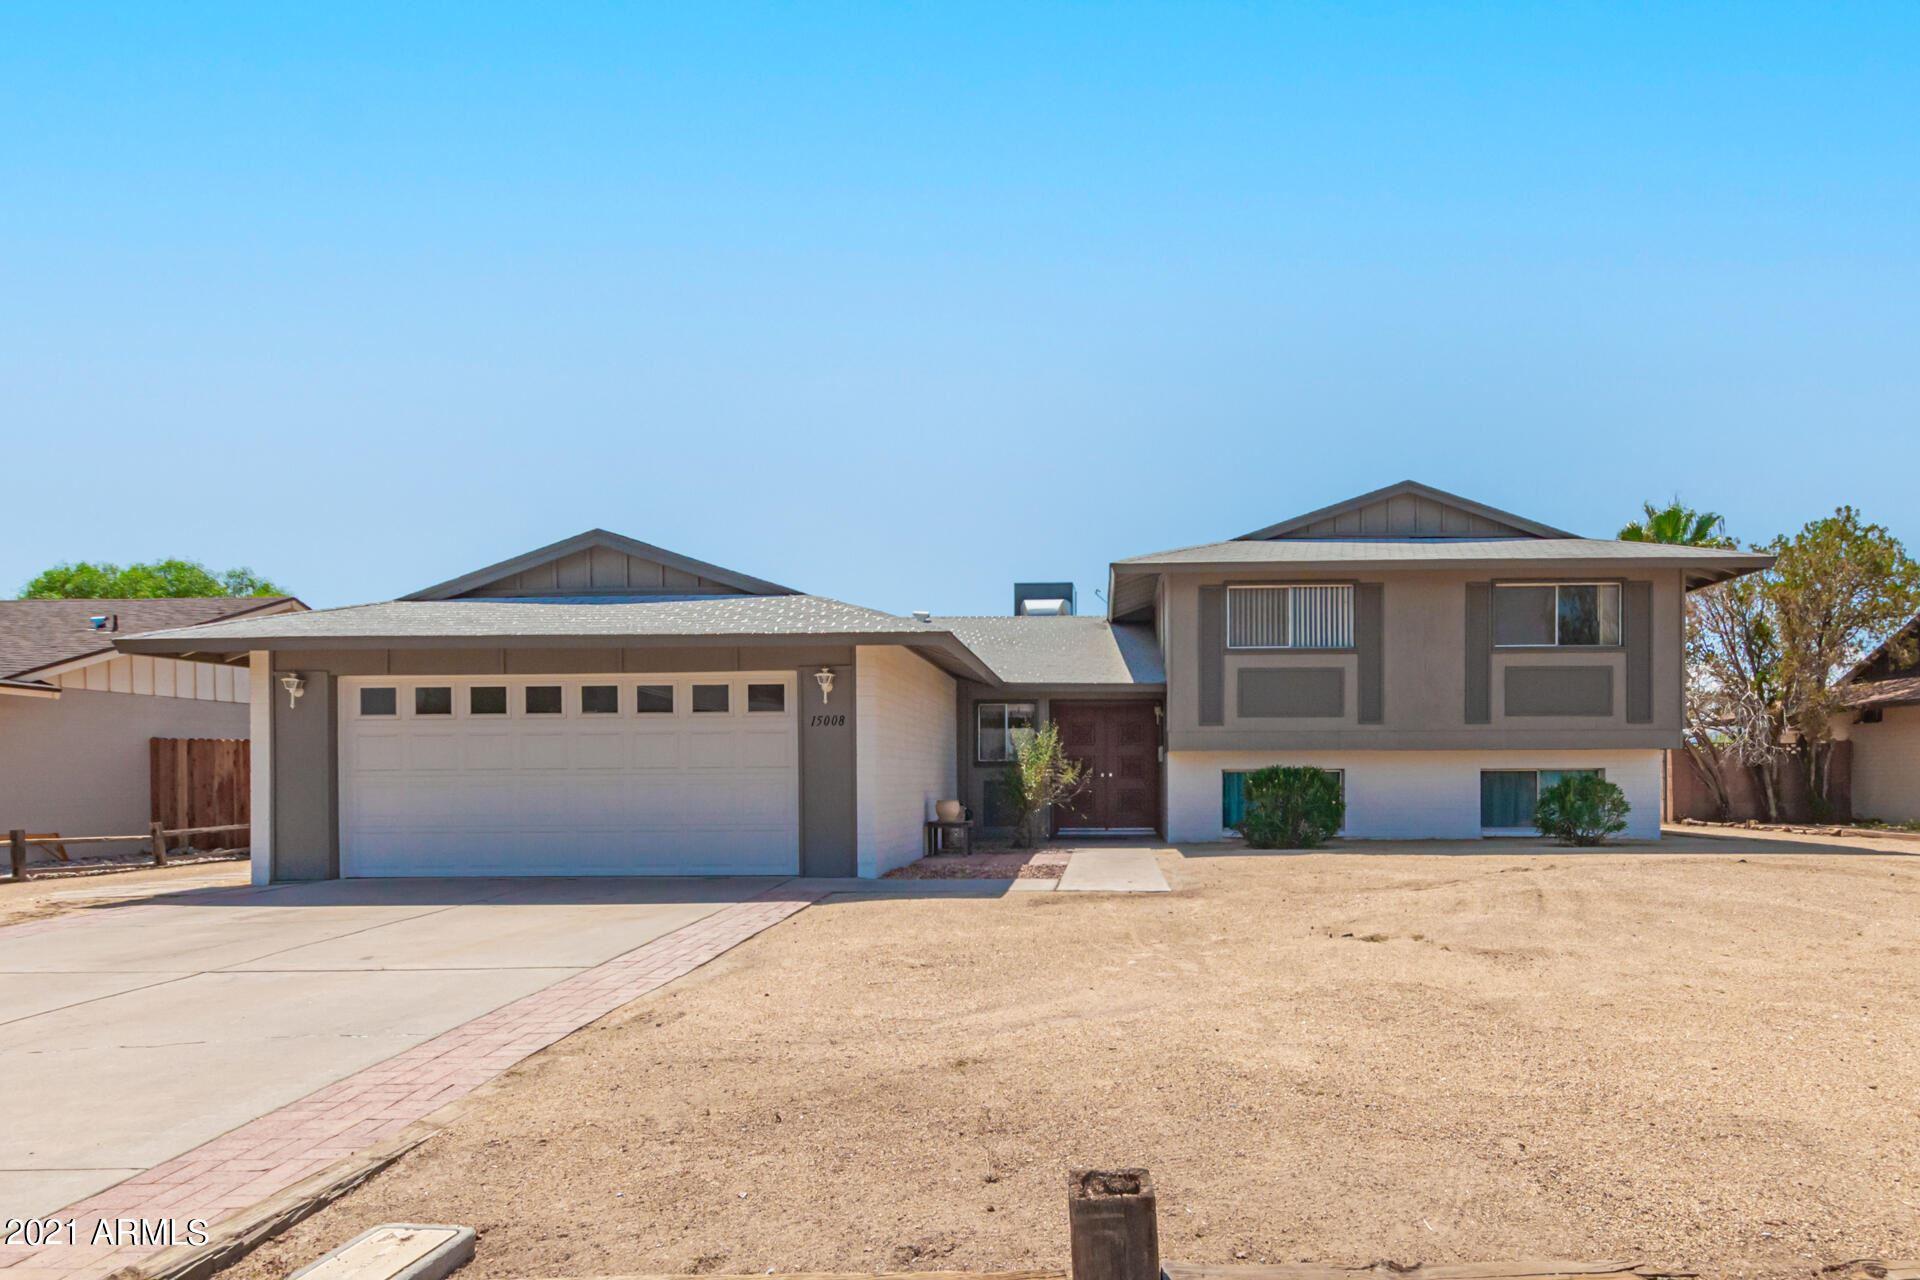 15008 N 38TH Avenue, Phoenix, AZ 85053 - MLS#: 6271708